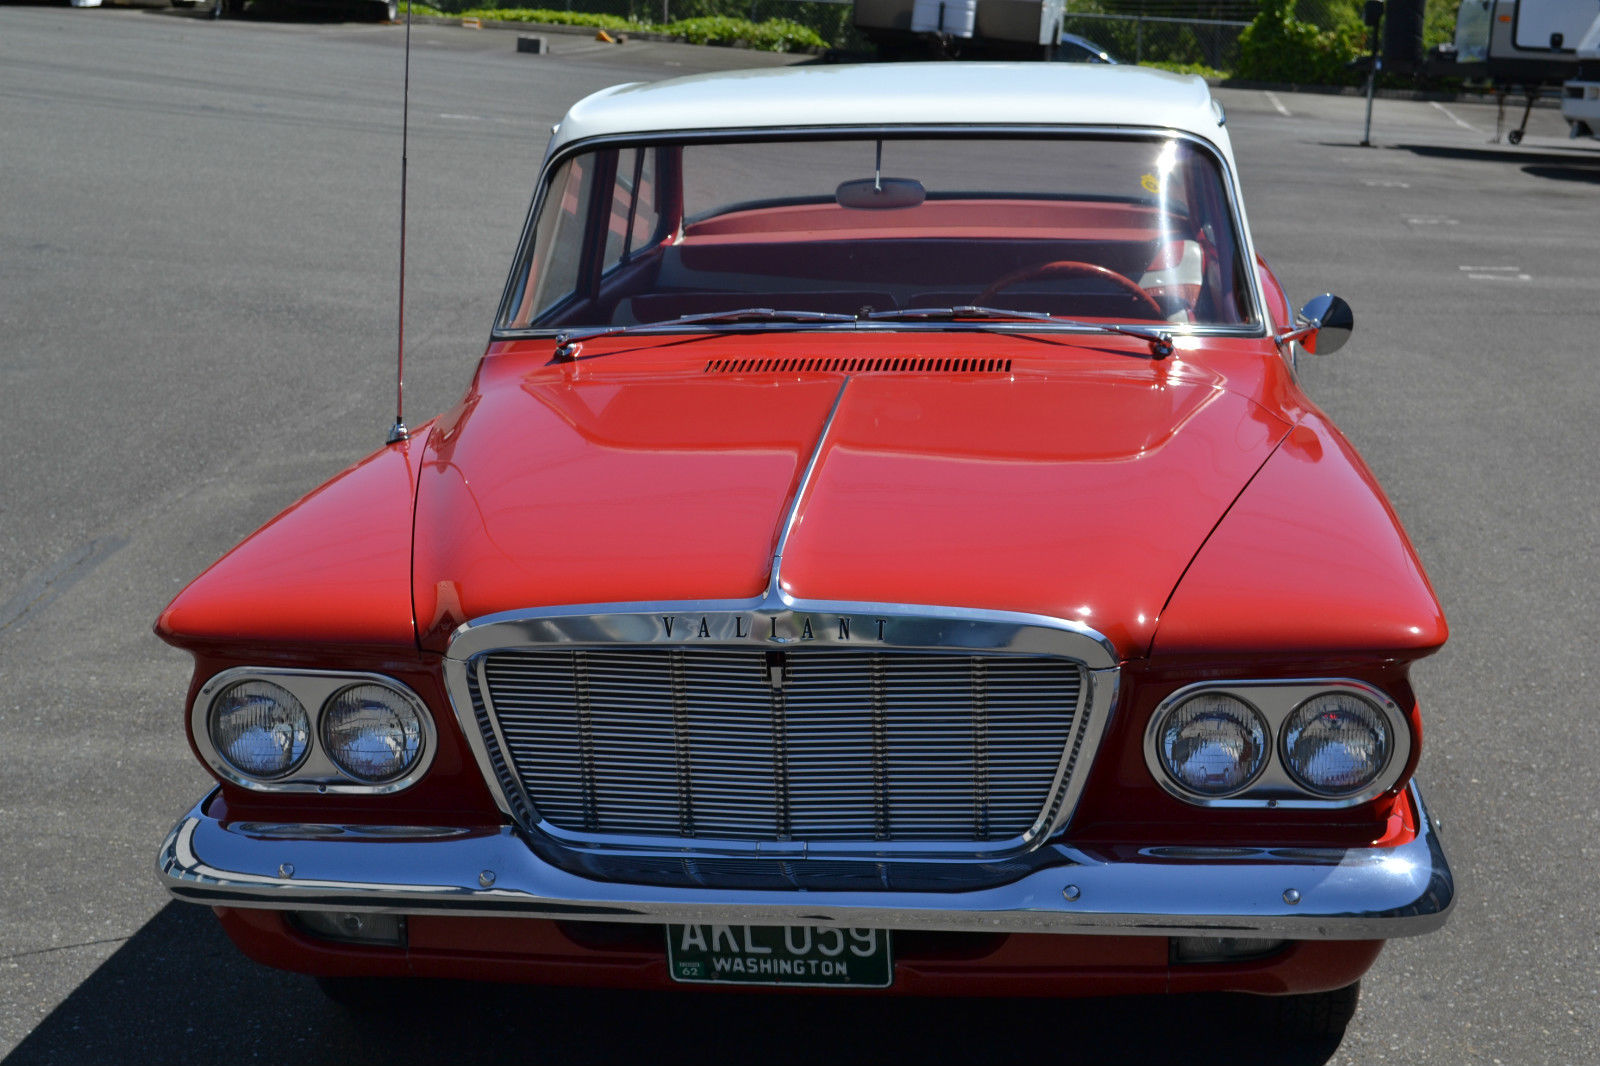 Stunning 1962 Plymouth Valiant Brings Back Memories